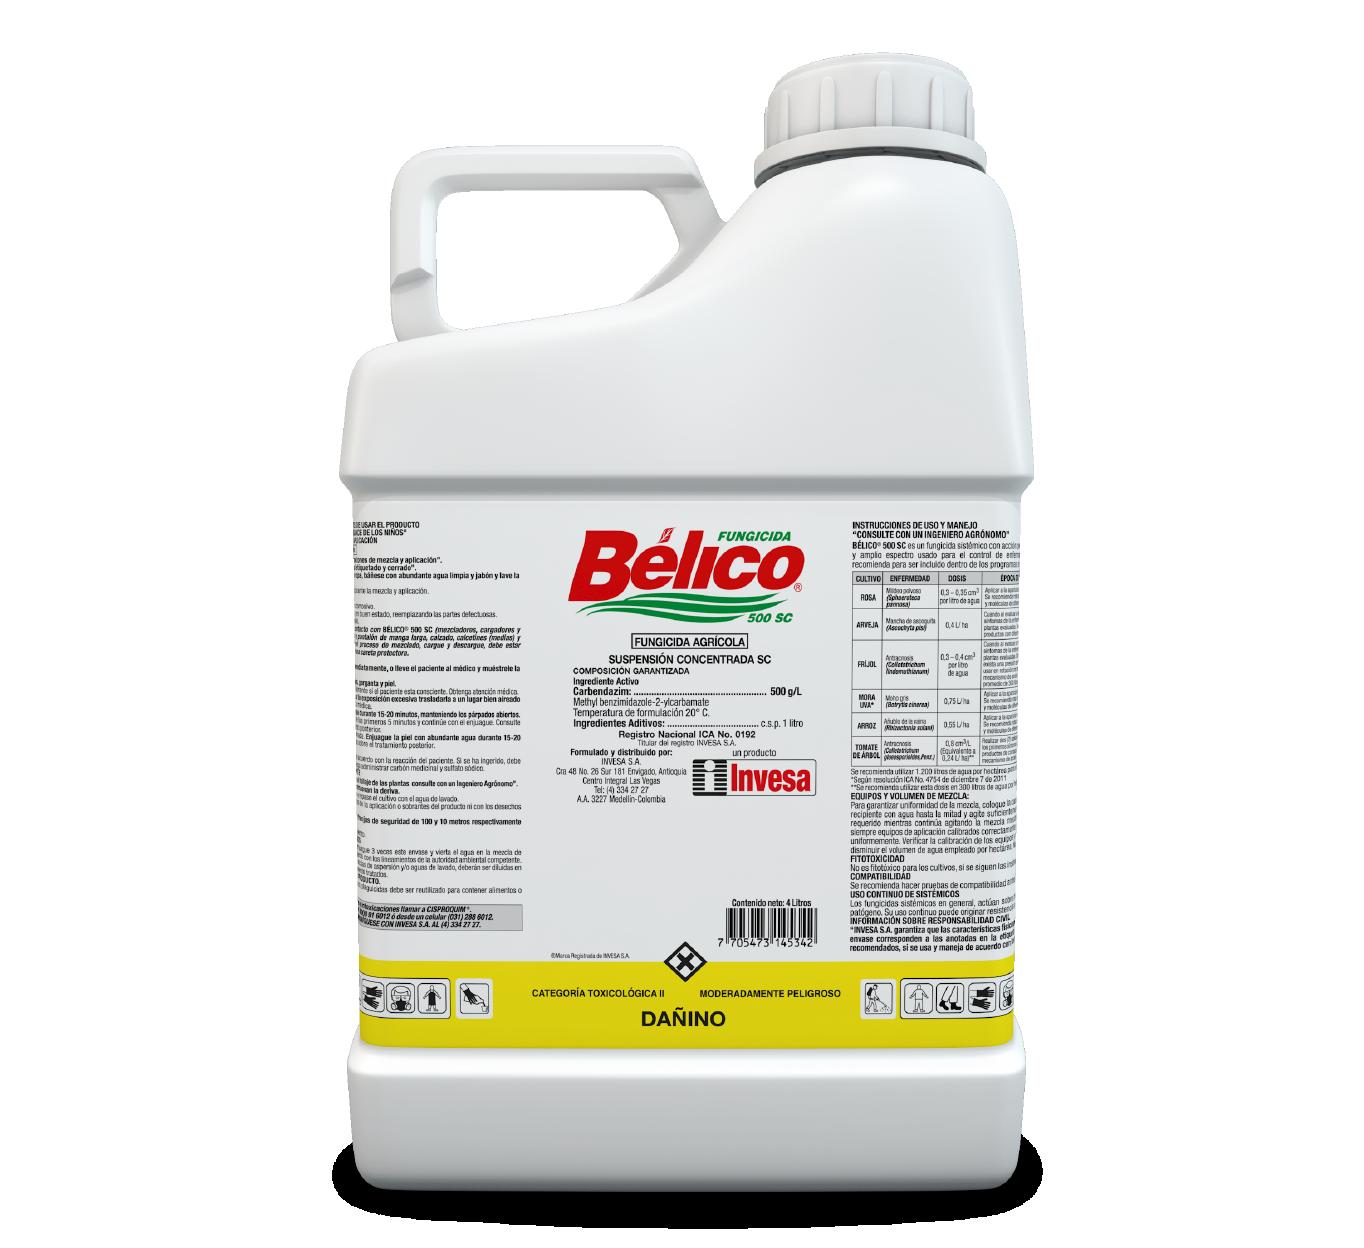 Fungicida belico 500 sc invesa 4 litros